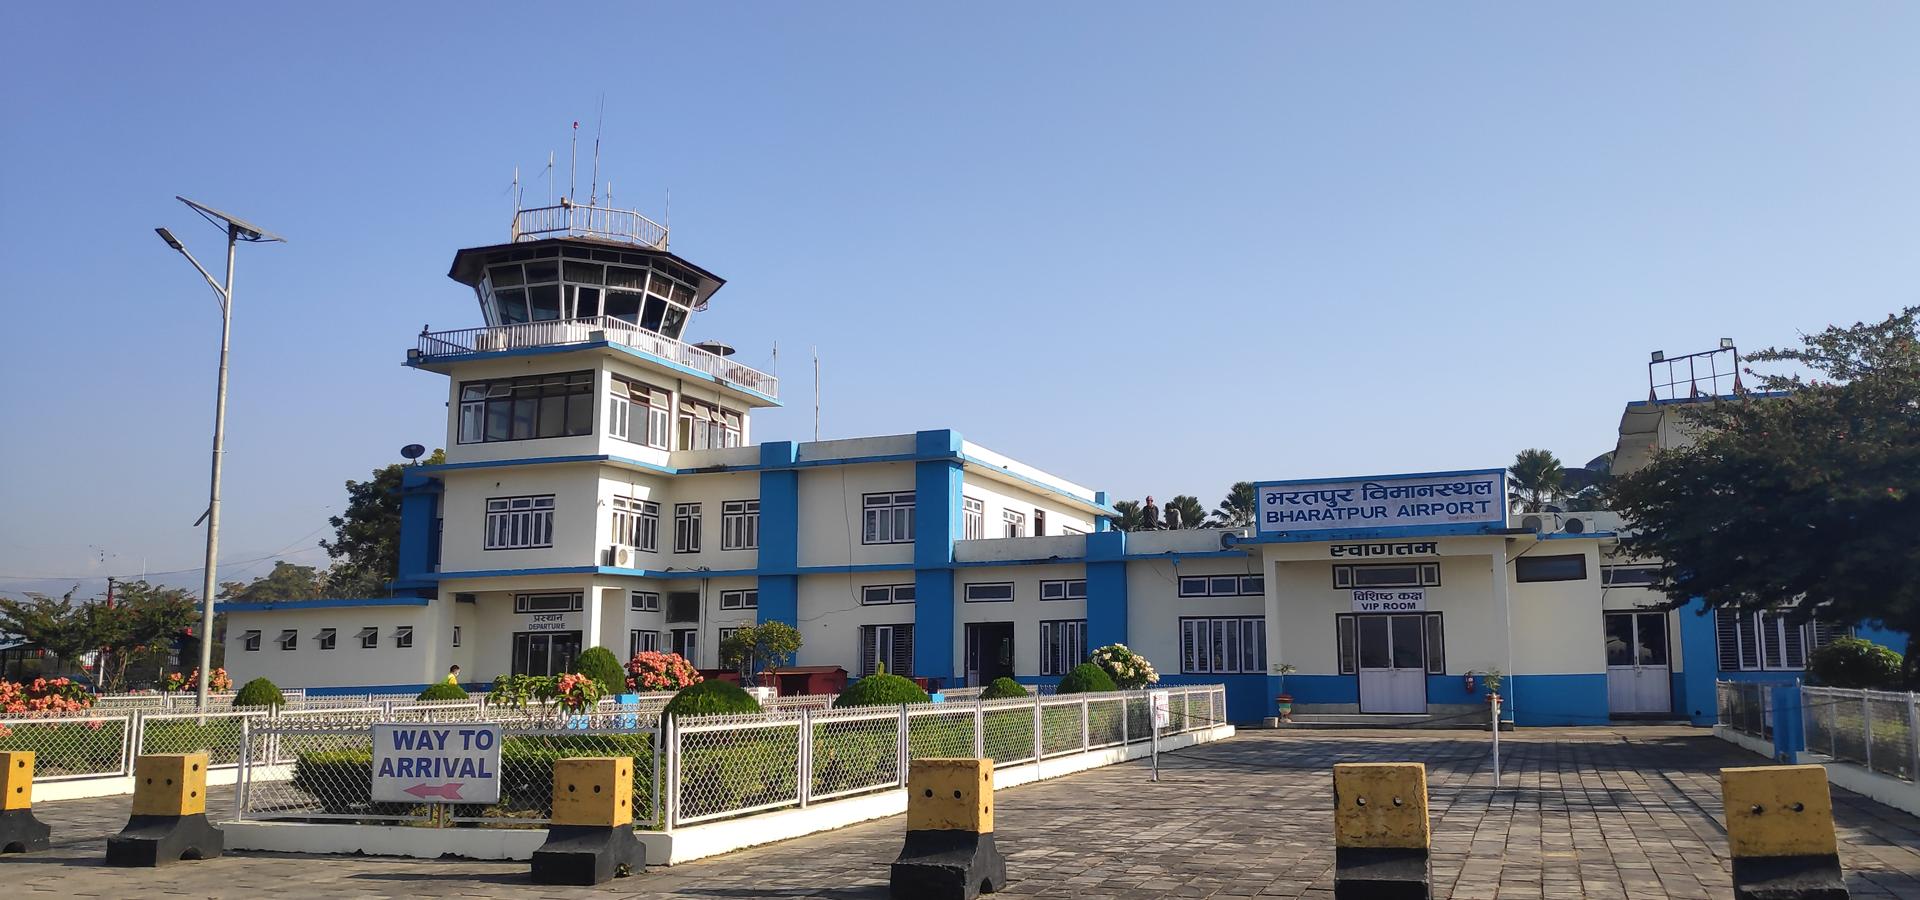 <b>Bharatpur, Chitwan District, Bagmati Province, Nepal</b>